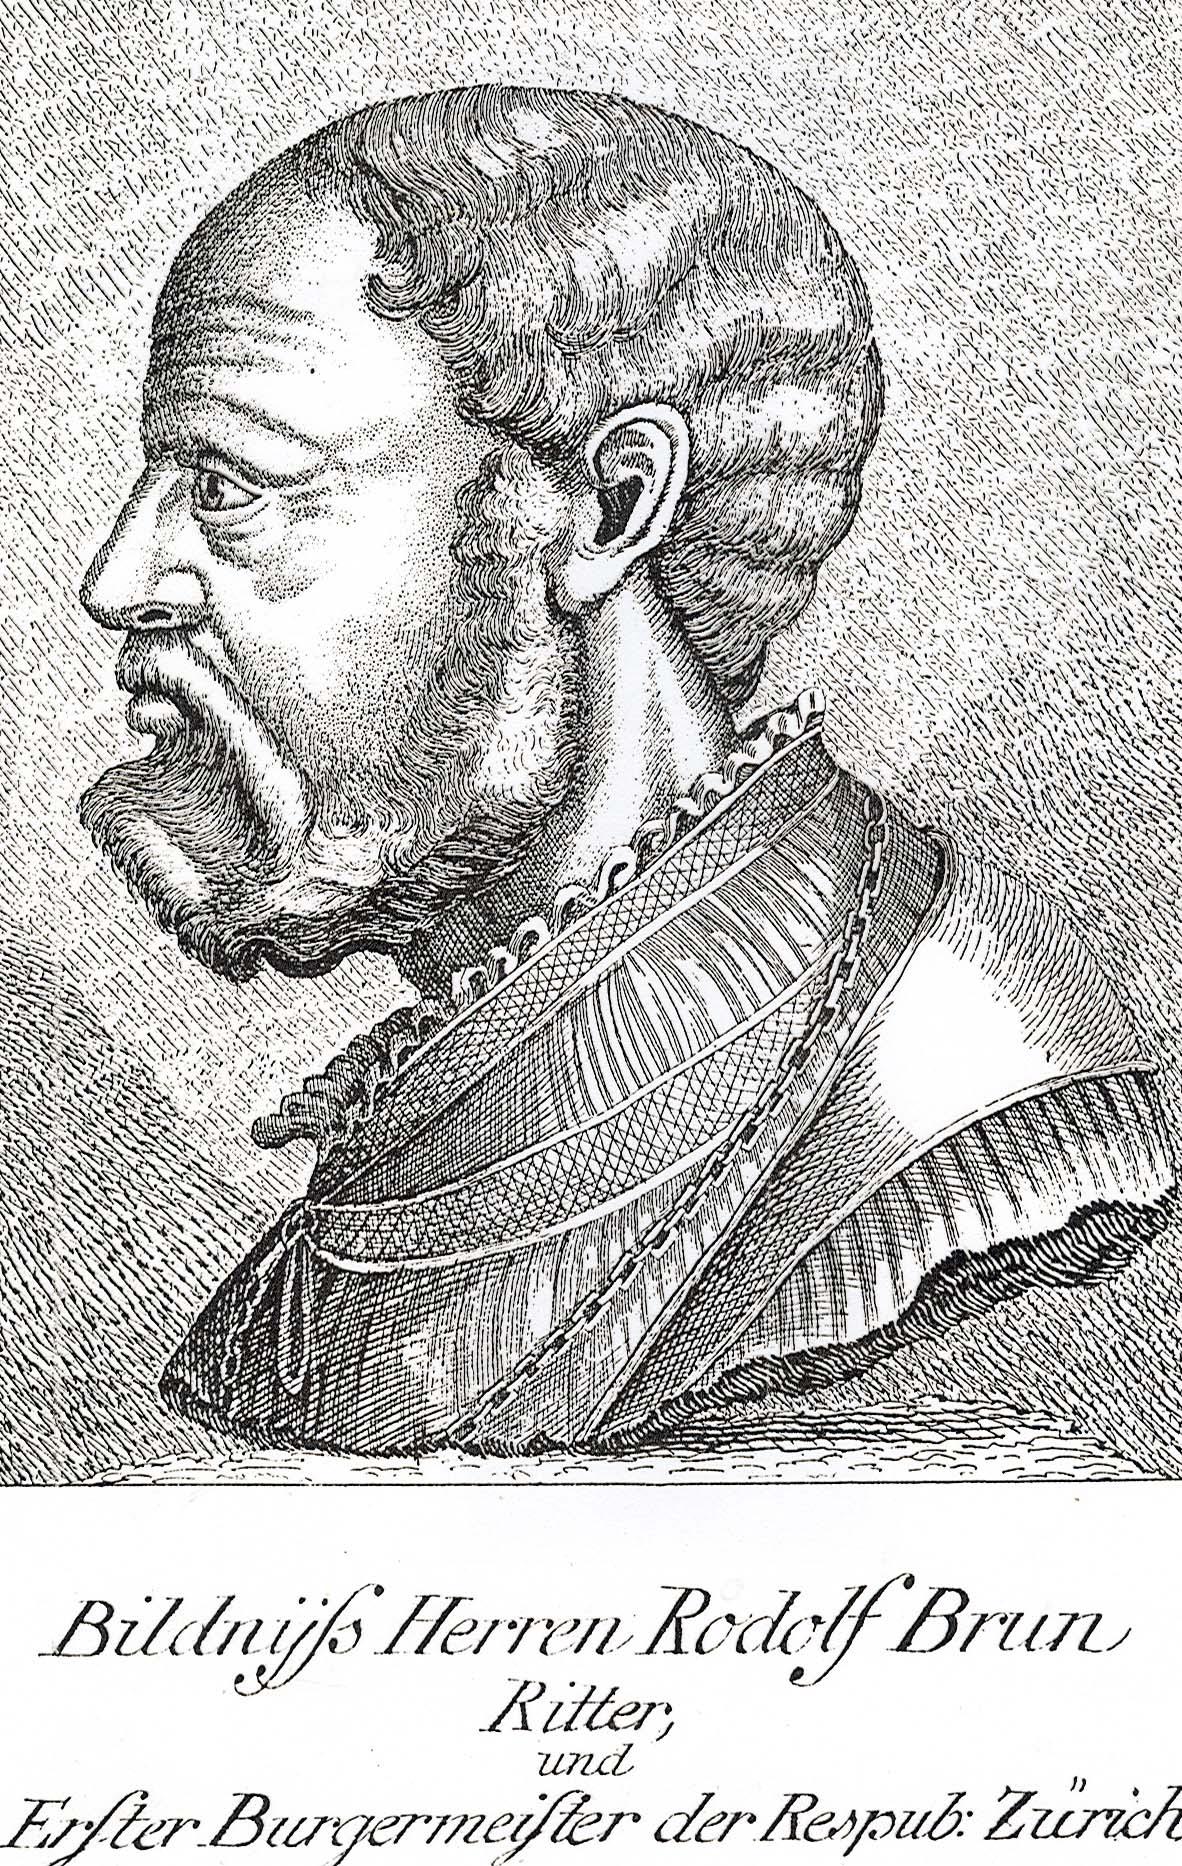 Rudolf Brun